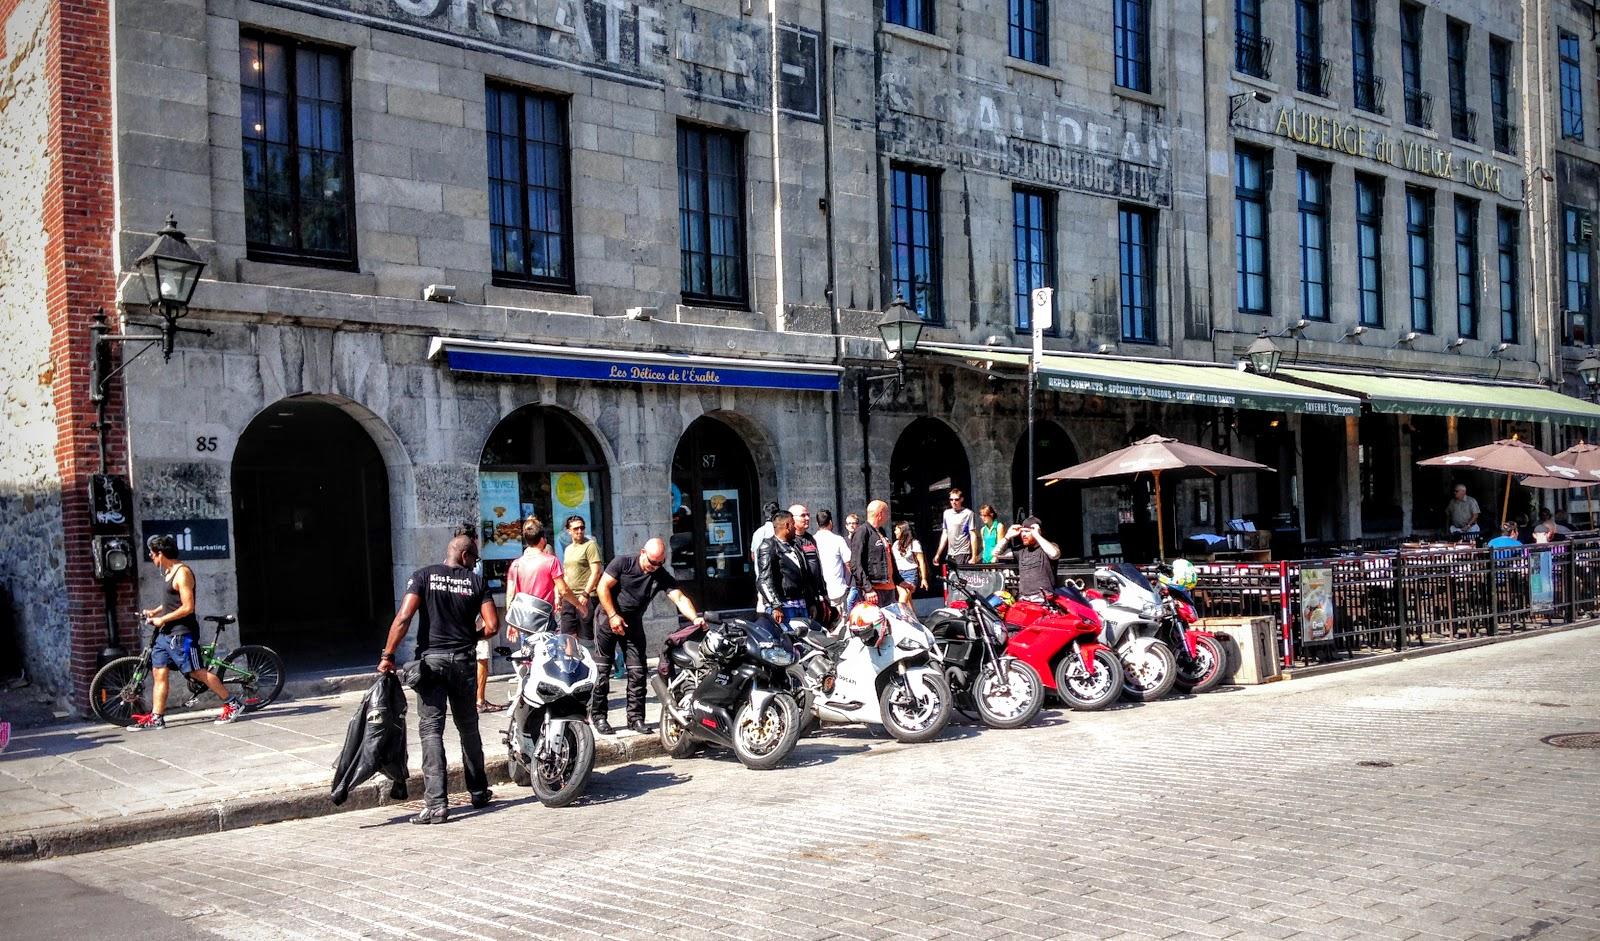 East Coast Ducs: Kiss French, Ride Italian